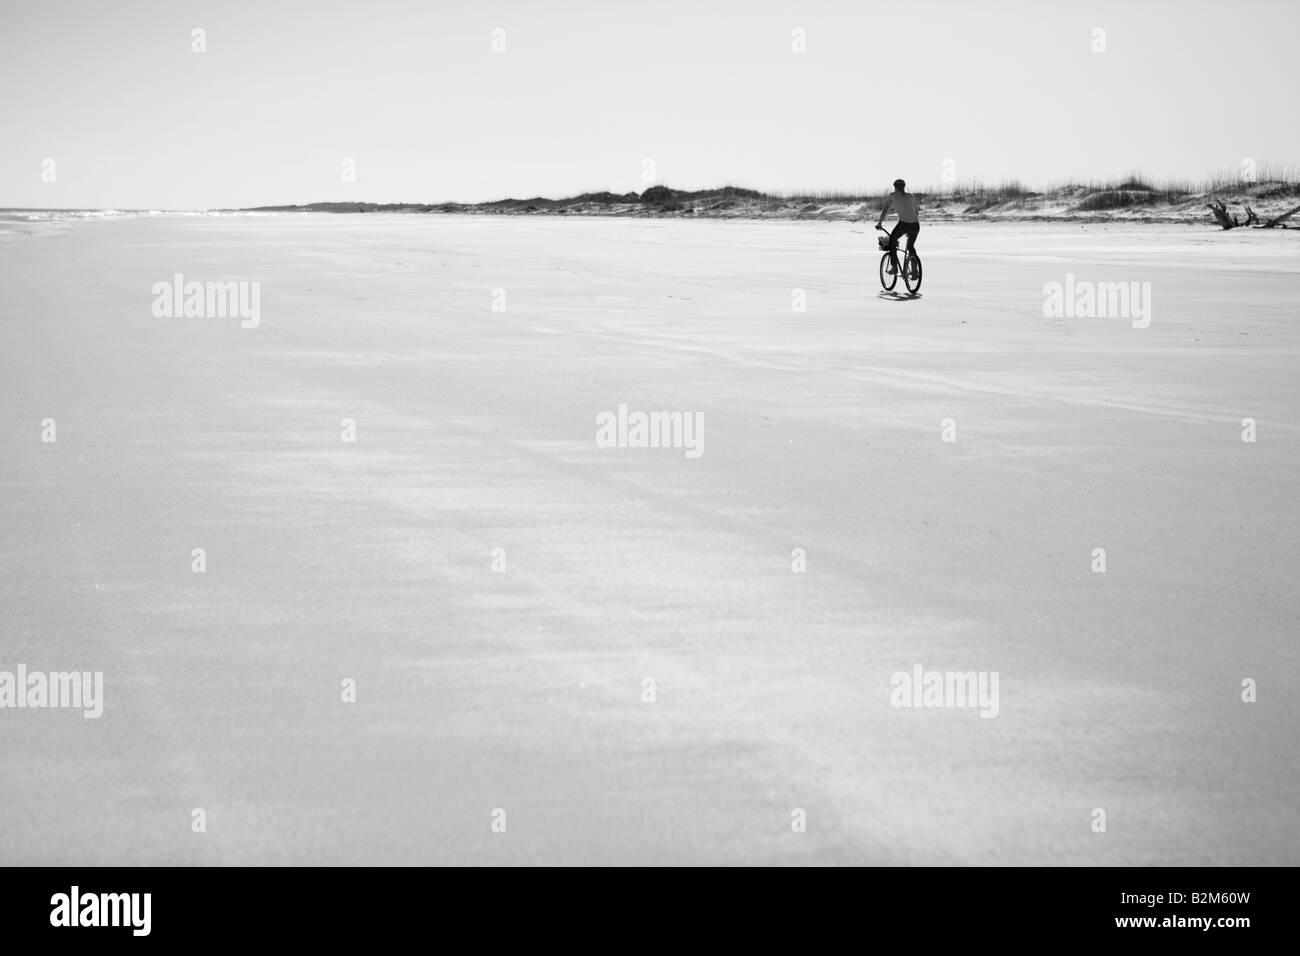 MAN RIDING A BICYCLE ON THE BEACH ON CUMBERLAND ISLAND GEORGIA USA - Stock Image